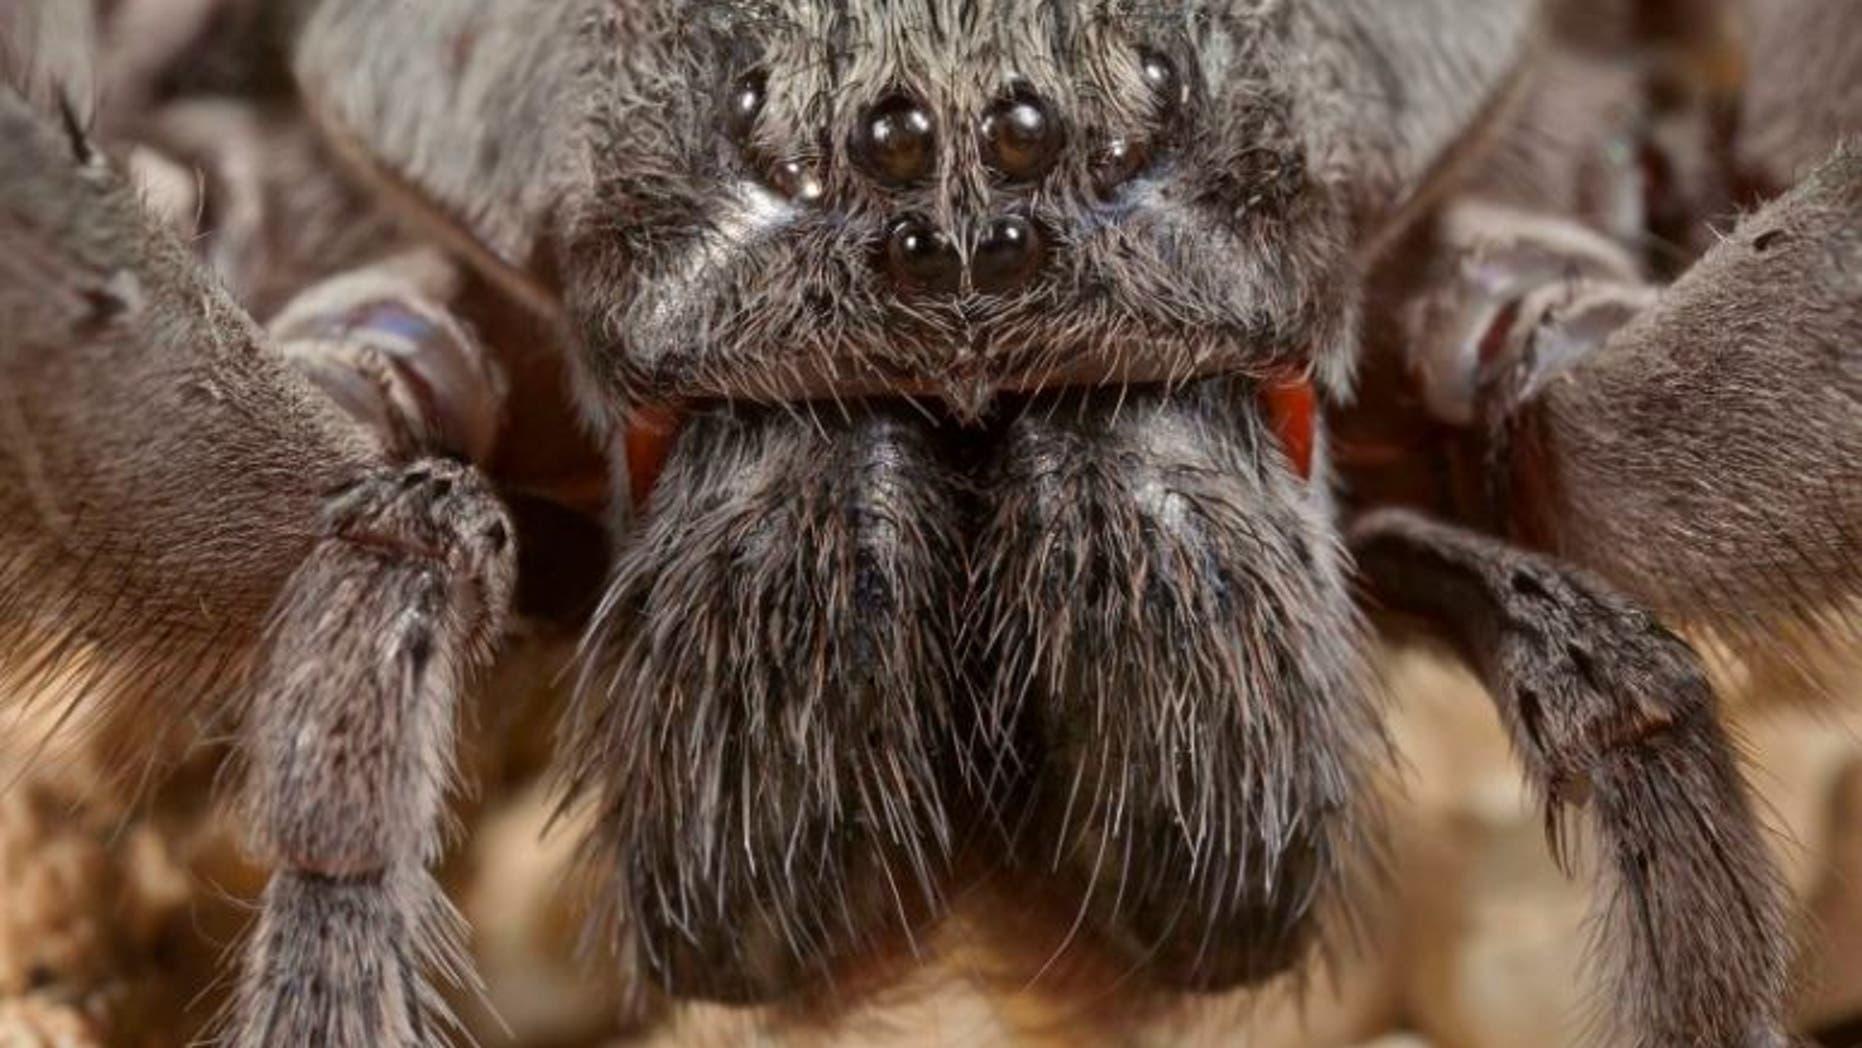 Despite its intimidating look, Califorctenus cacachilensis' venom is not fatal to humans.